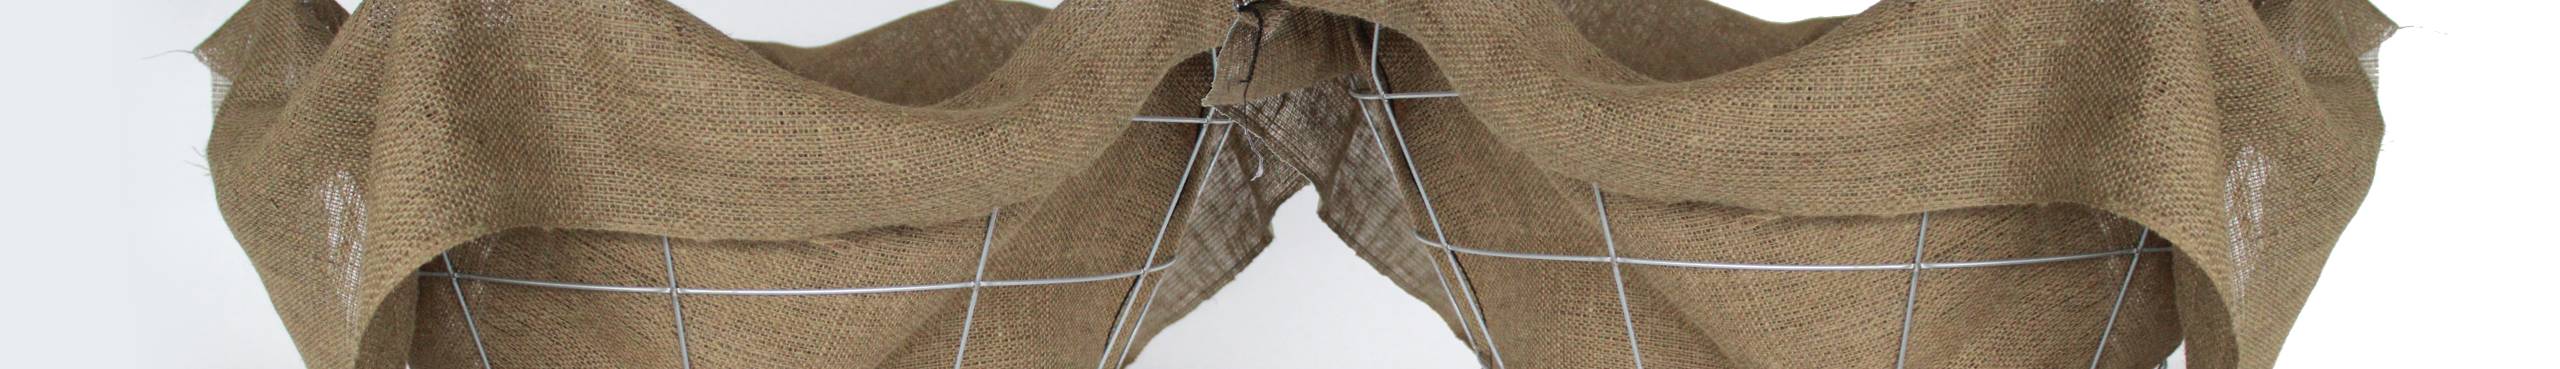 Nursery - Flat Folded Burlap Basket Liners